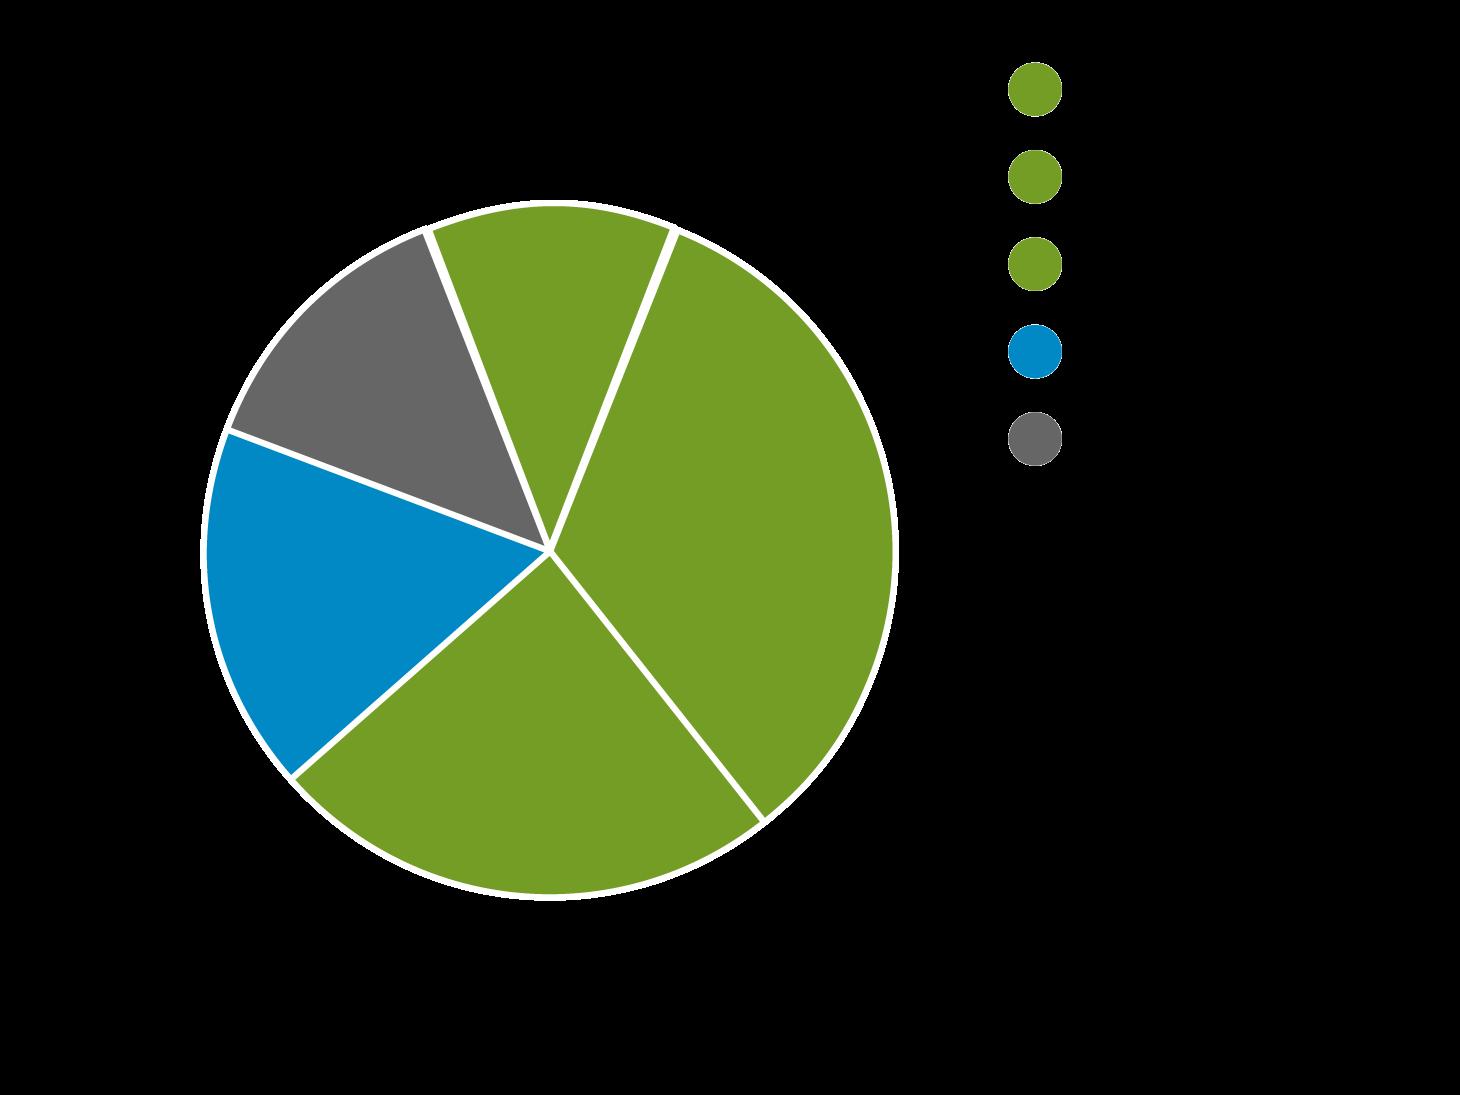 Powermix pie chart desktop robertscribbler nvjuhfo Gallery